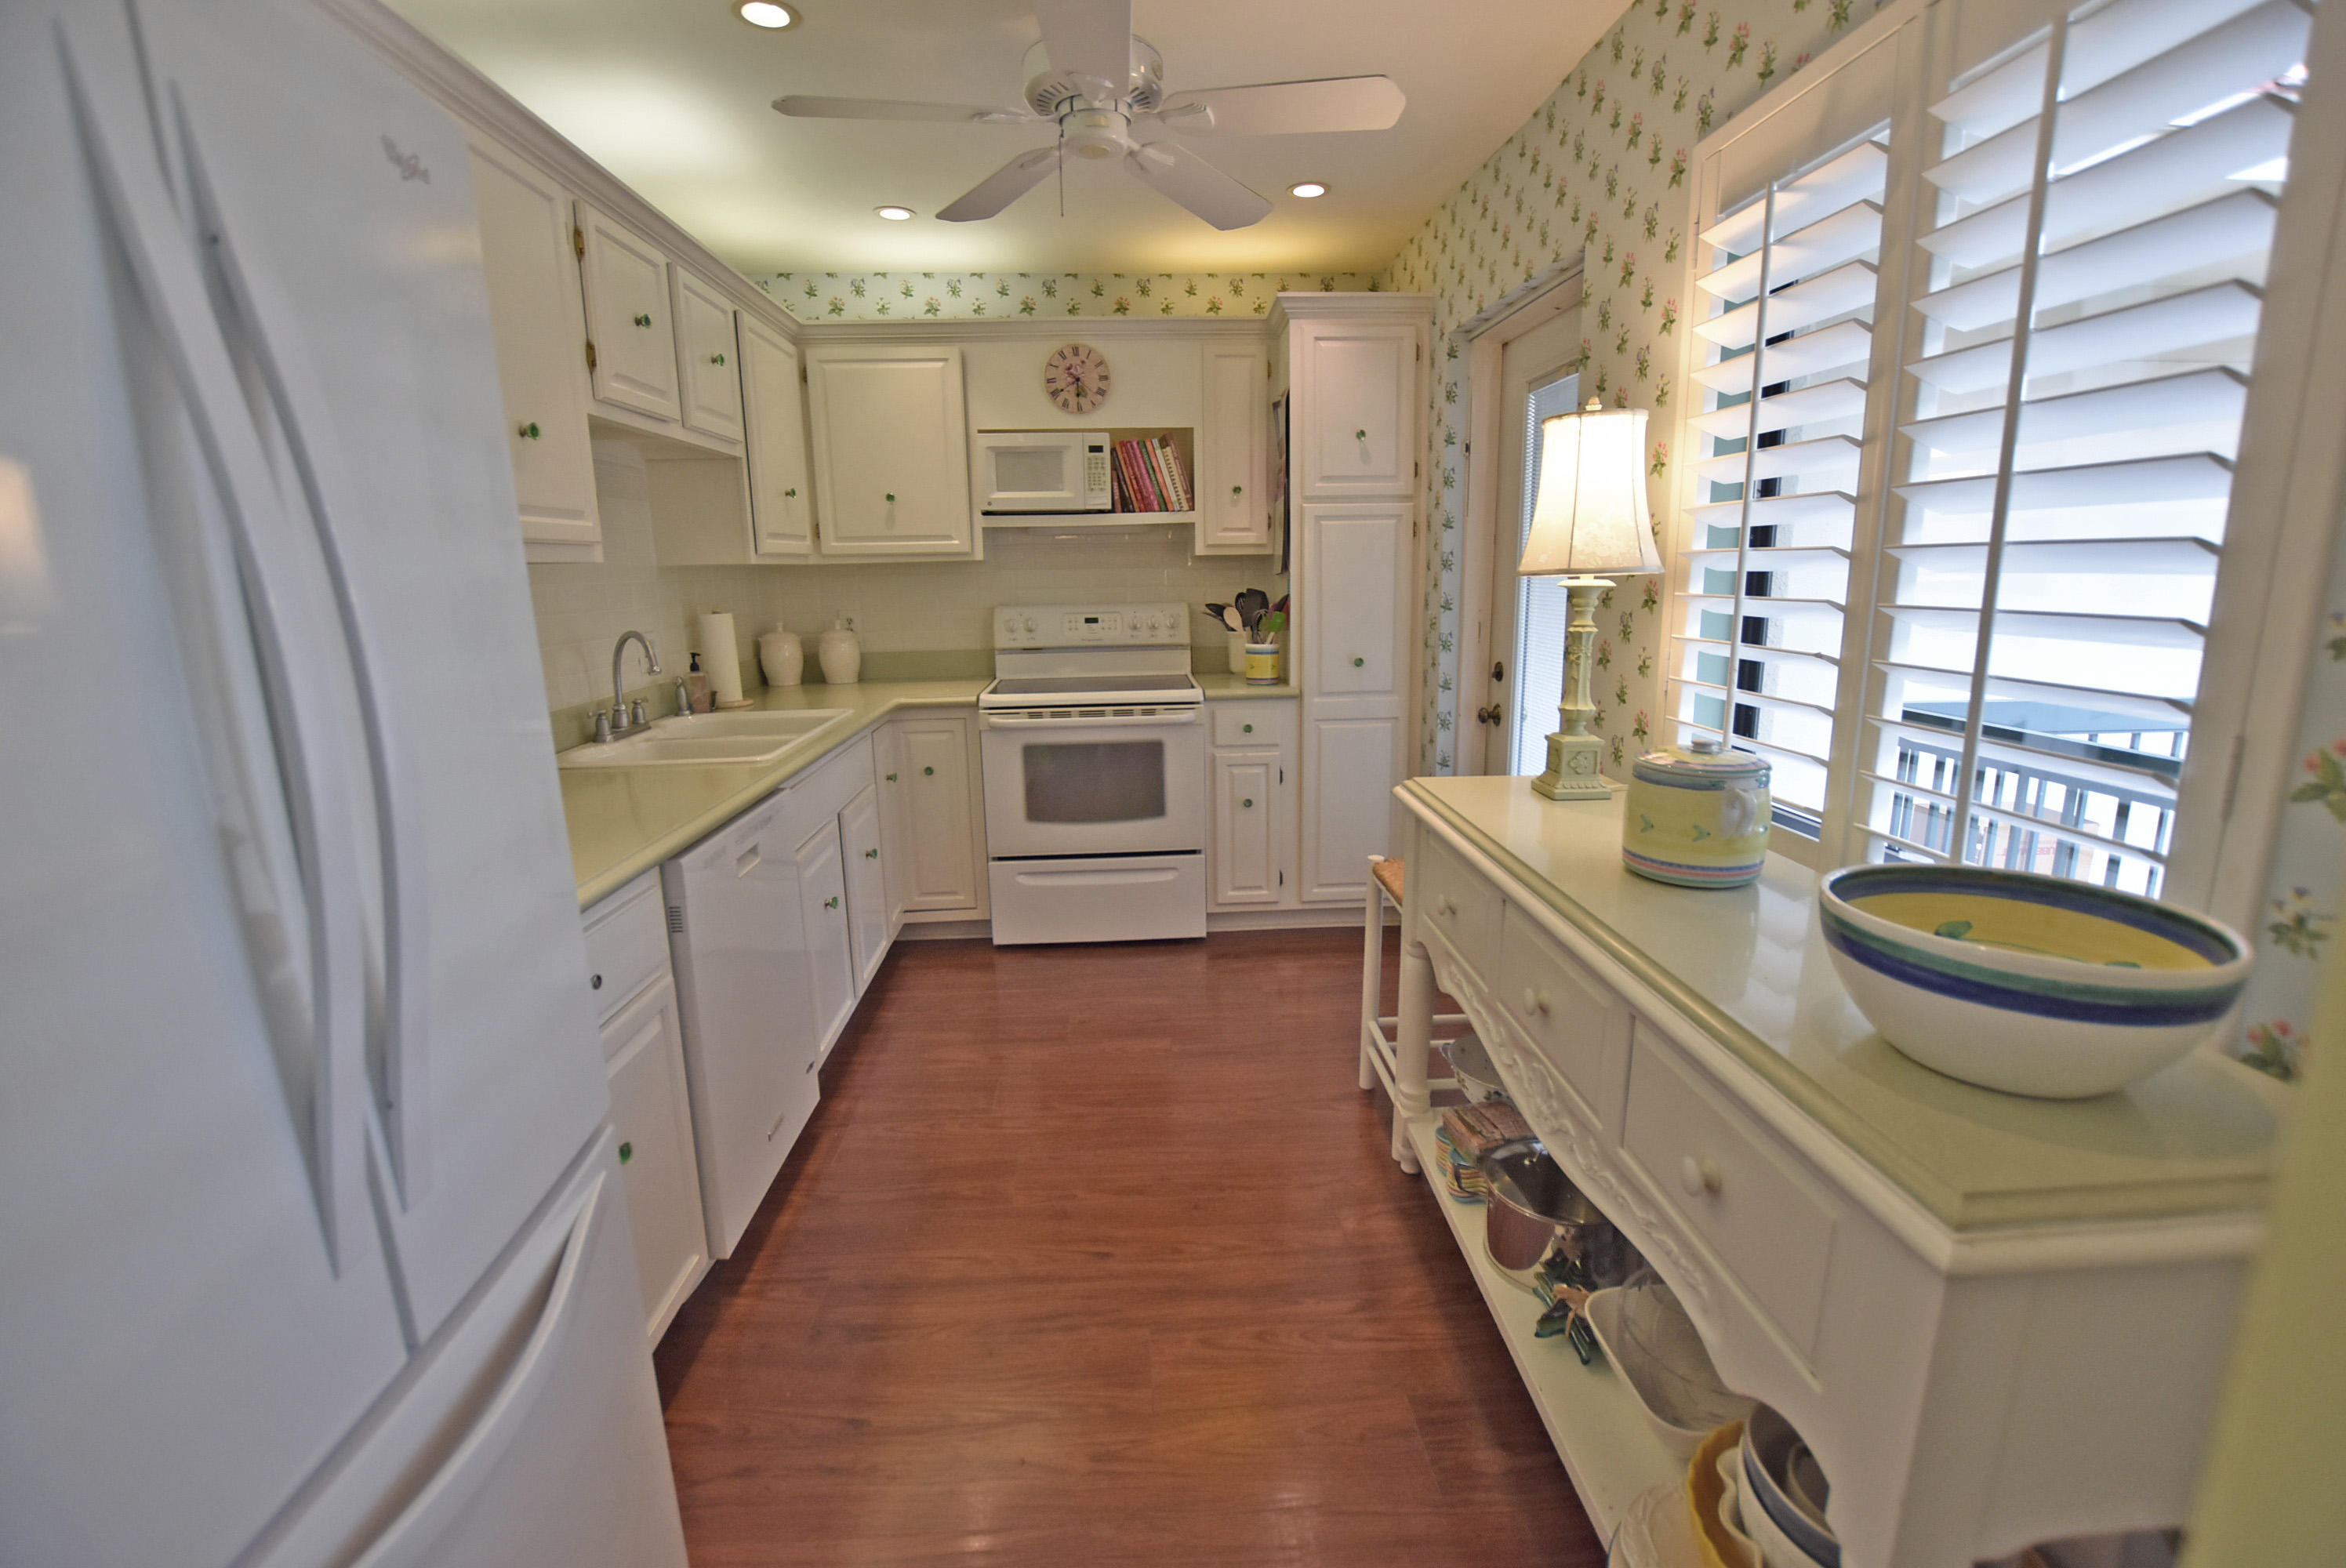 4116 B Quail Ridge Drive, Boynton Beach, Florida 33436, 2 Bedrooms Bedrooms, ,2 BathroomsBathrooms,Condo/Coop,For Sale,Osprey,Quail Ridge,2,RX-10463743